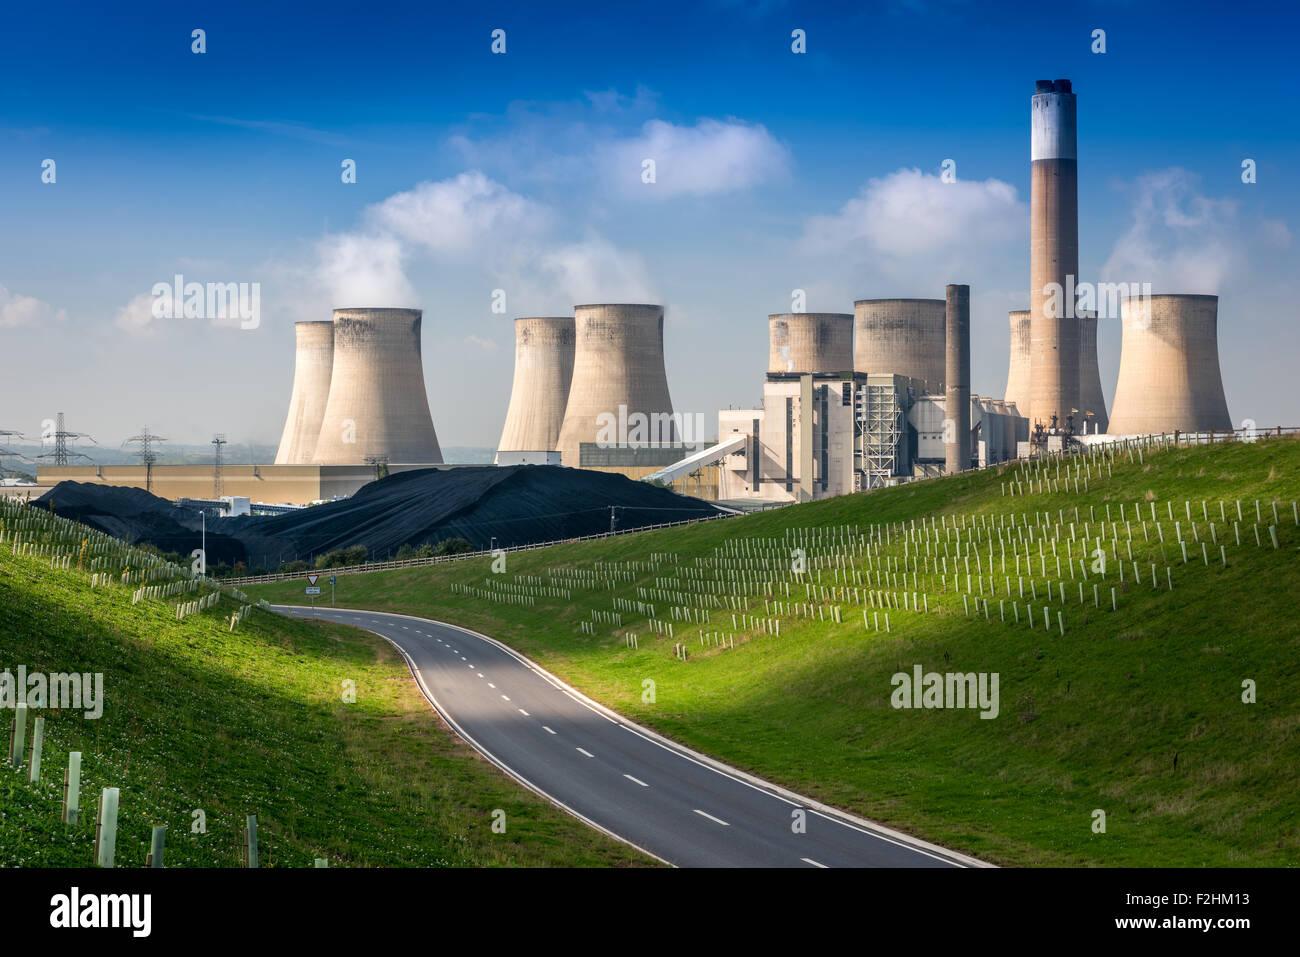 Ratcliffe-on-Soar Power Station Imagen De Stock